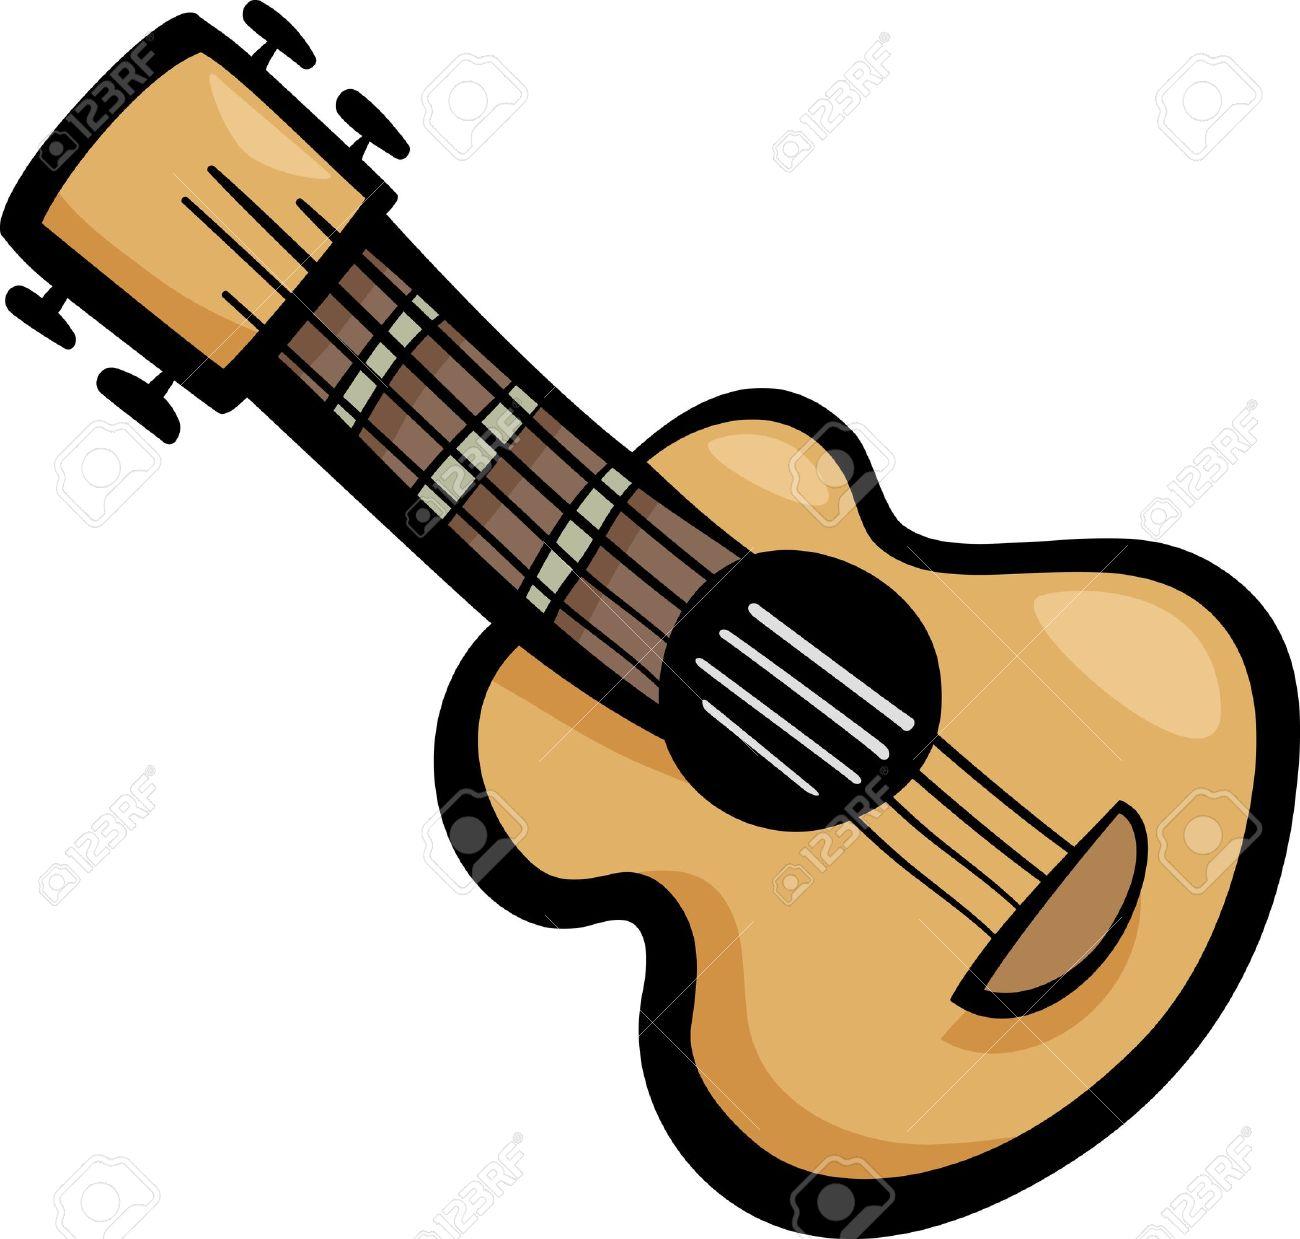 Guitar Clipart Free.